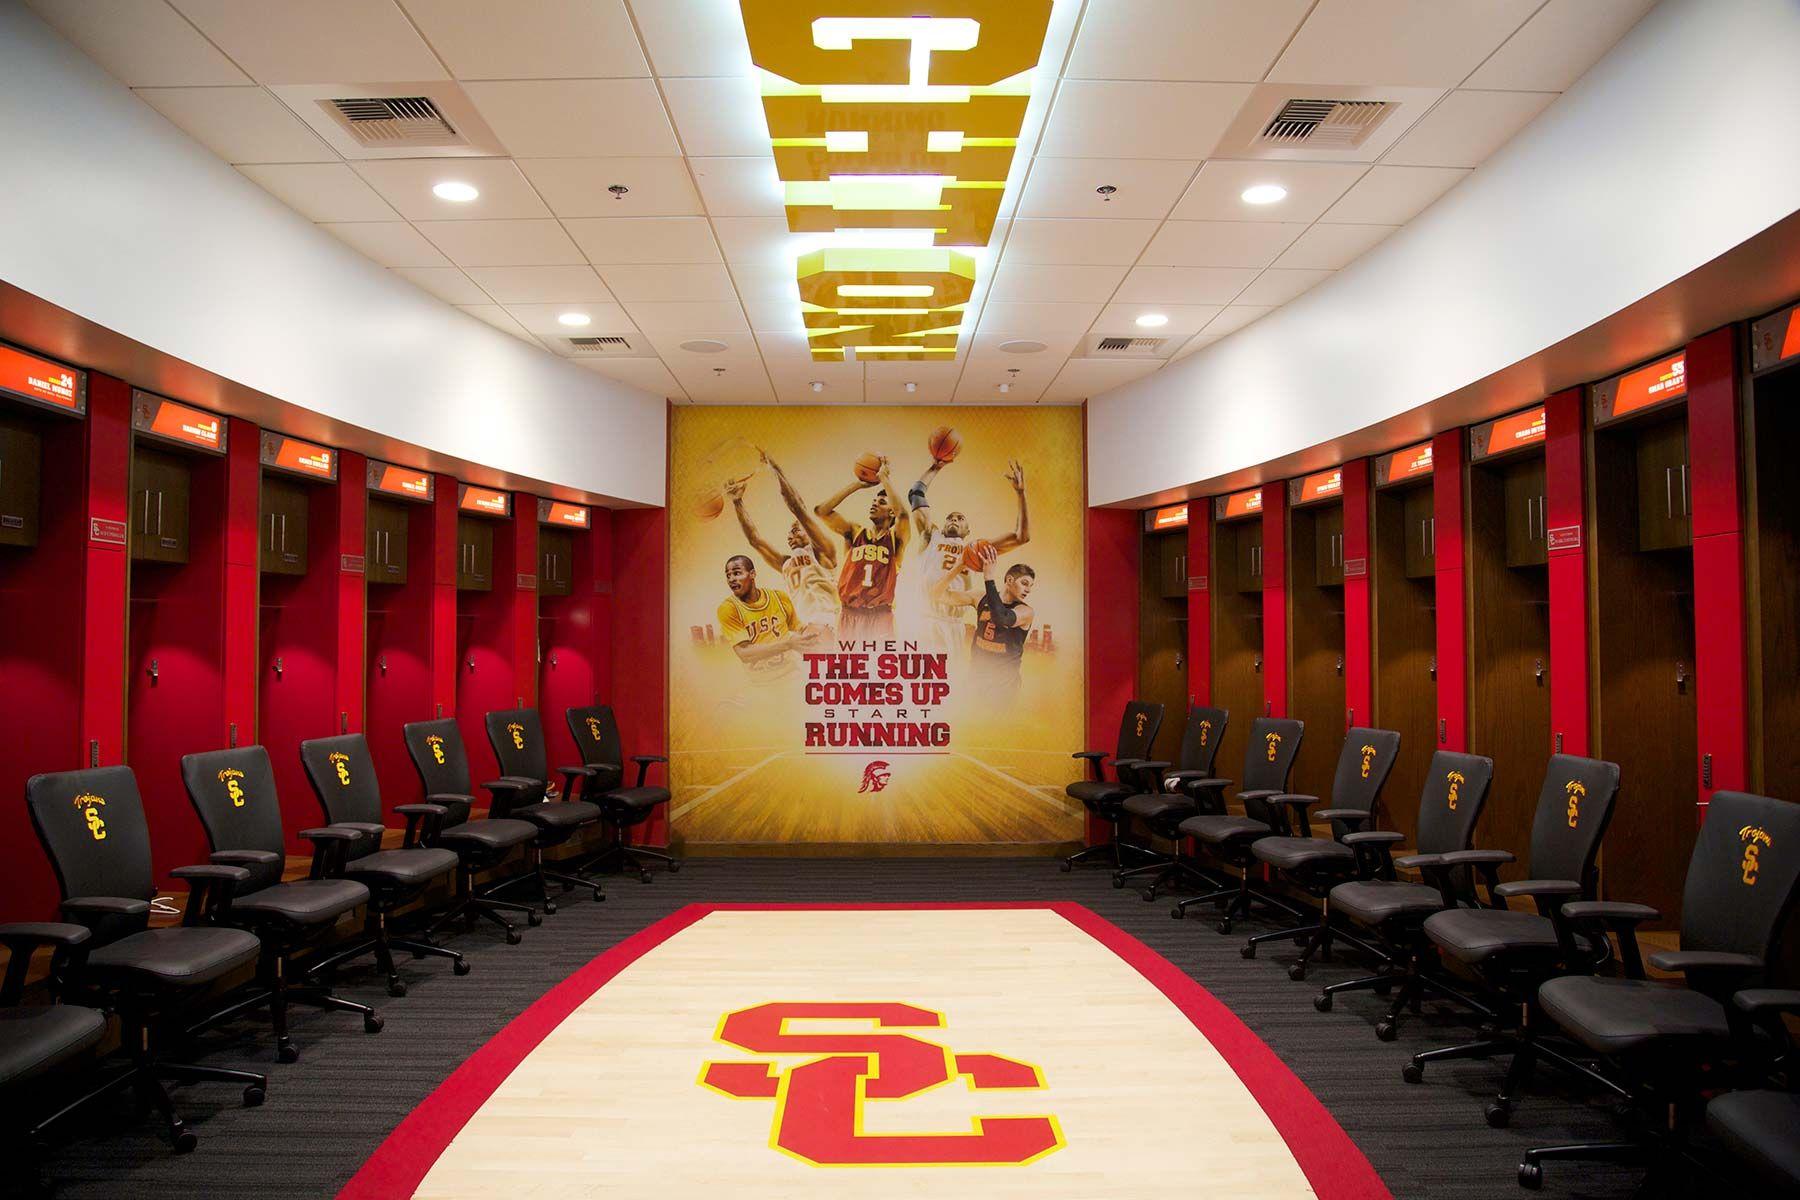 University of Southern California Men's Basketball